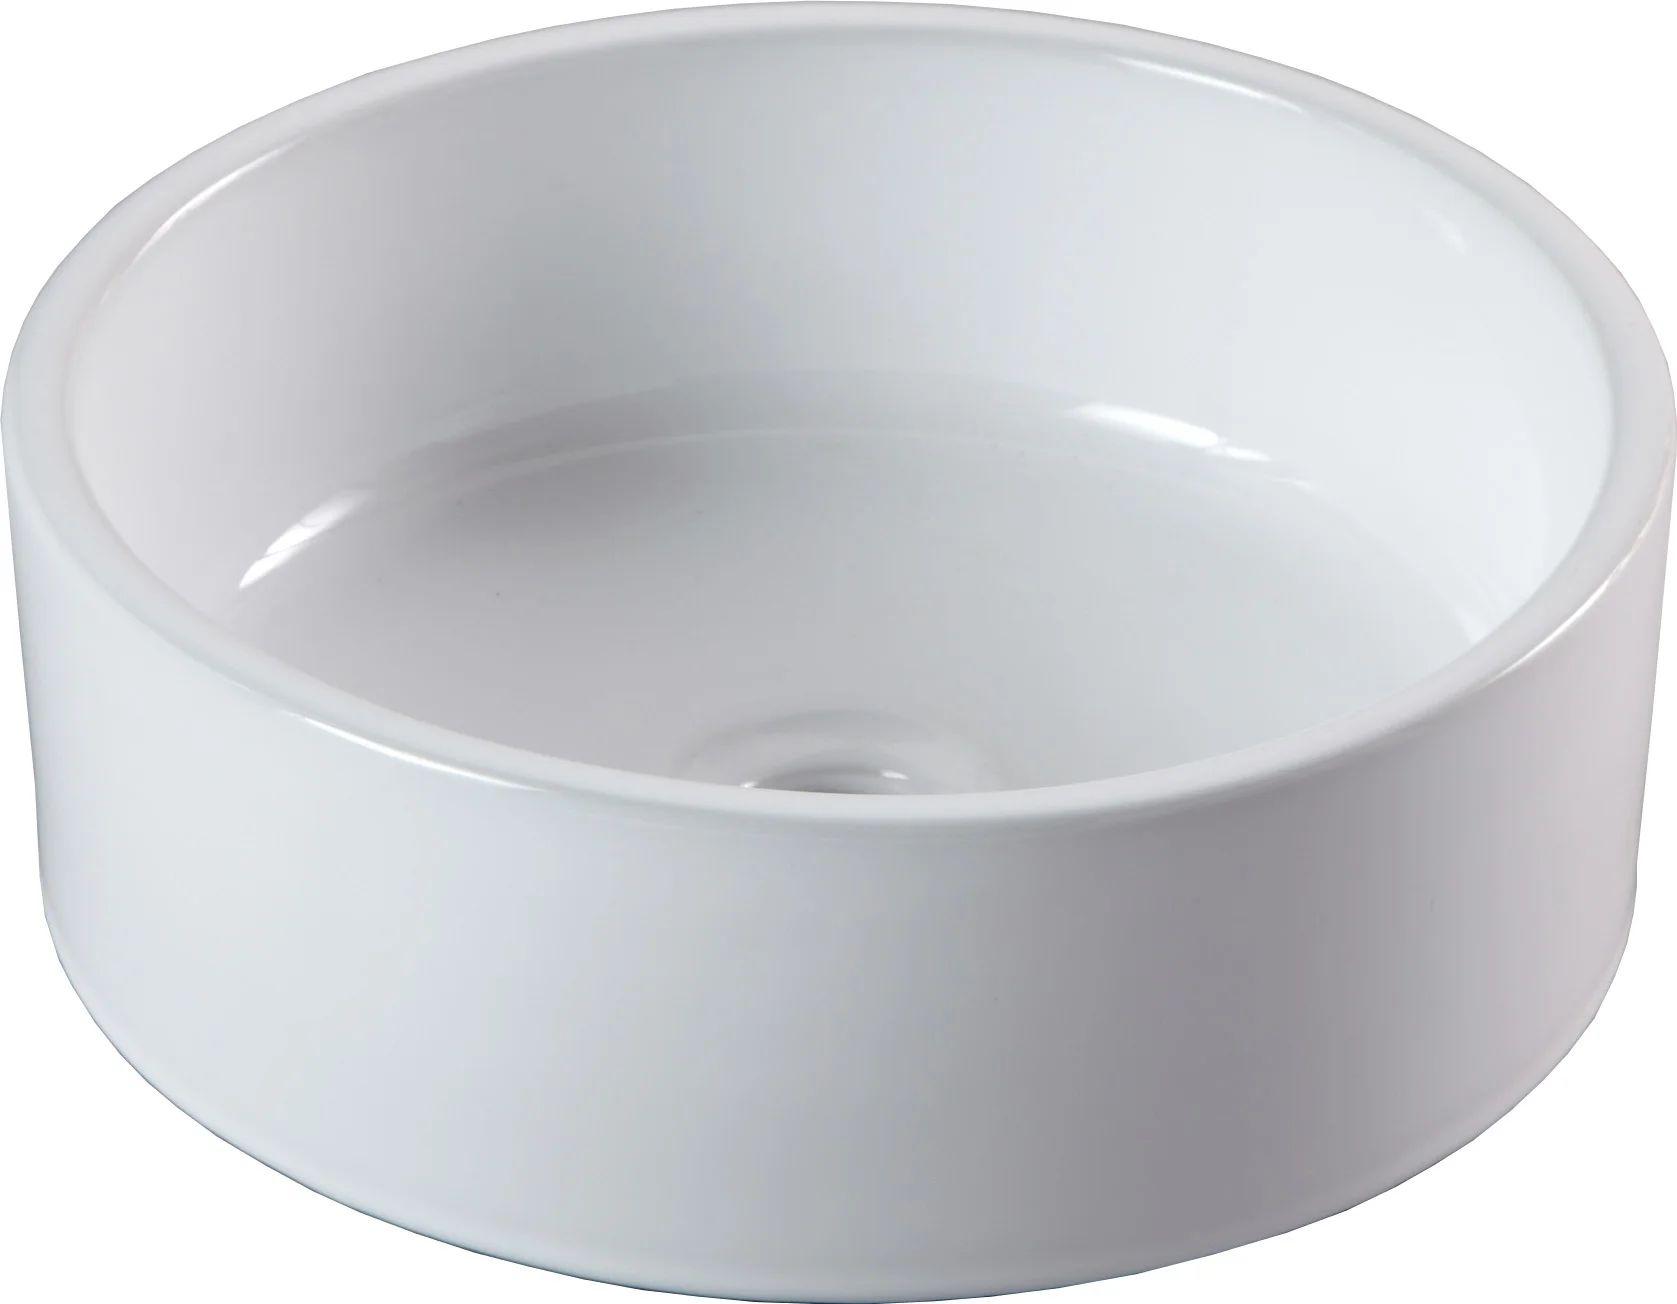 Vasque A Poser Ceramique Diam 35 Cm Blanc Tube Leroy Merlin